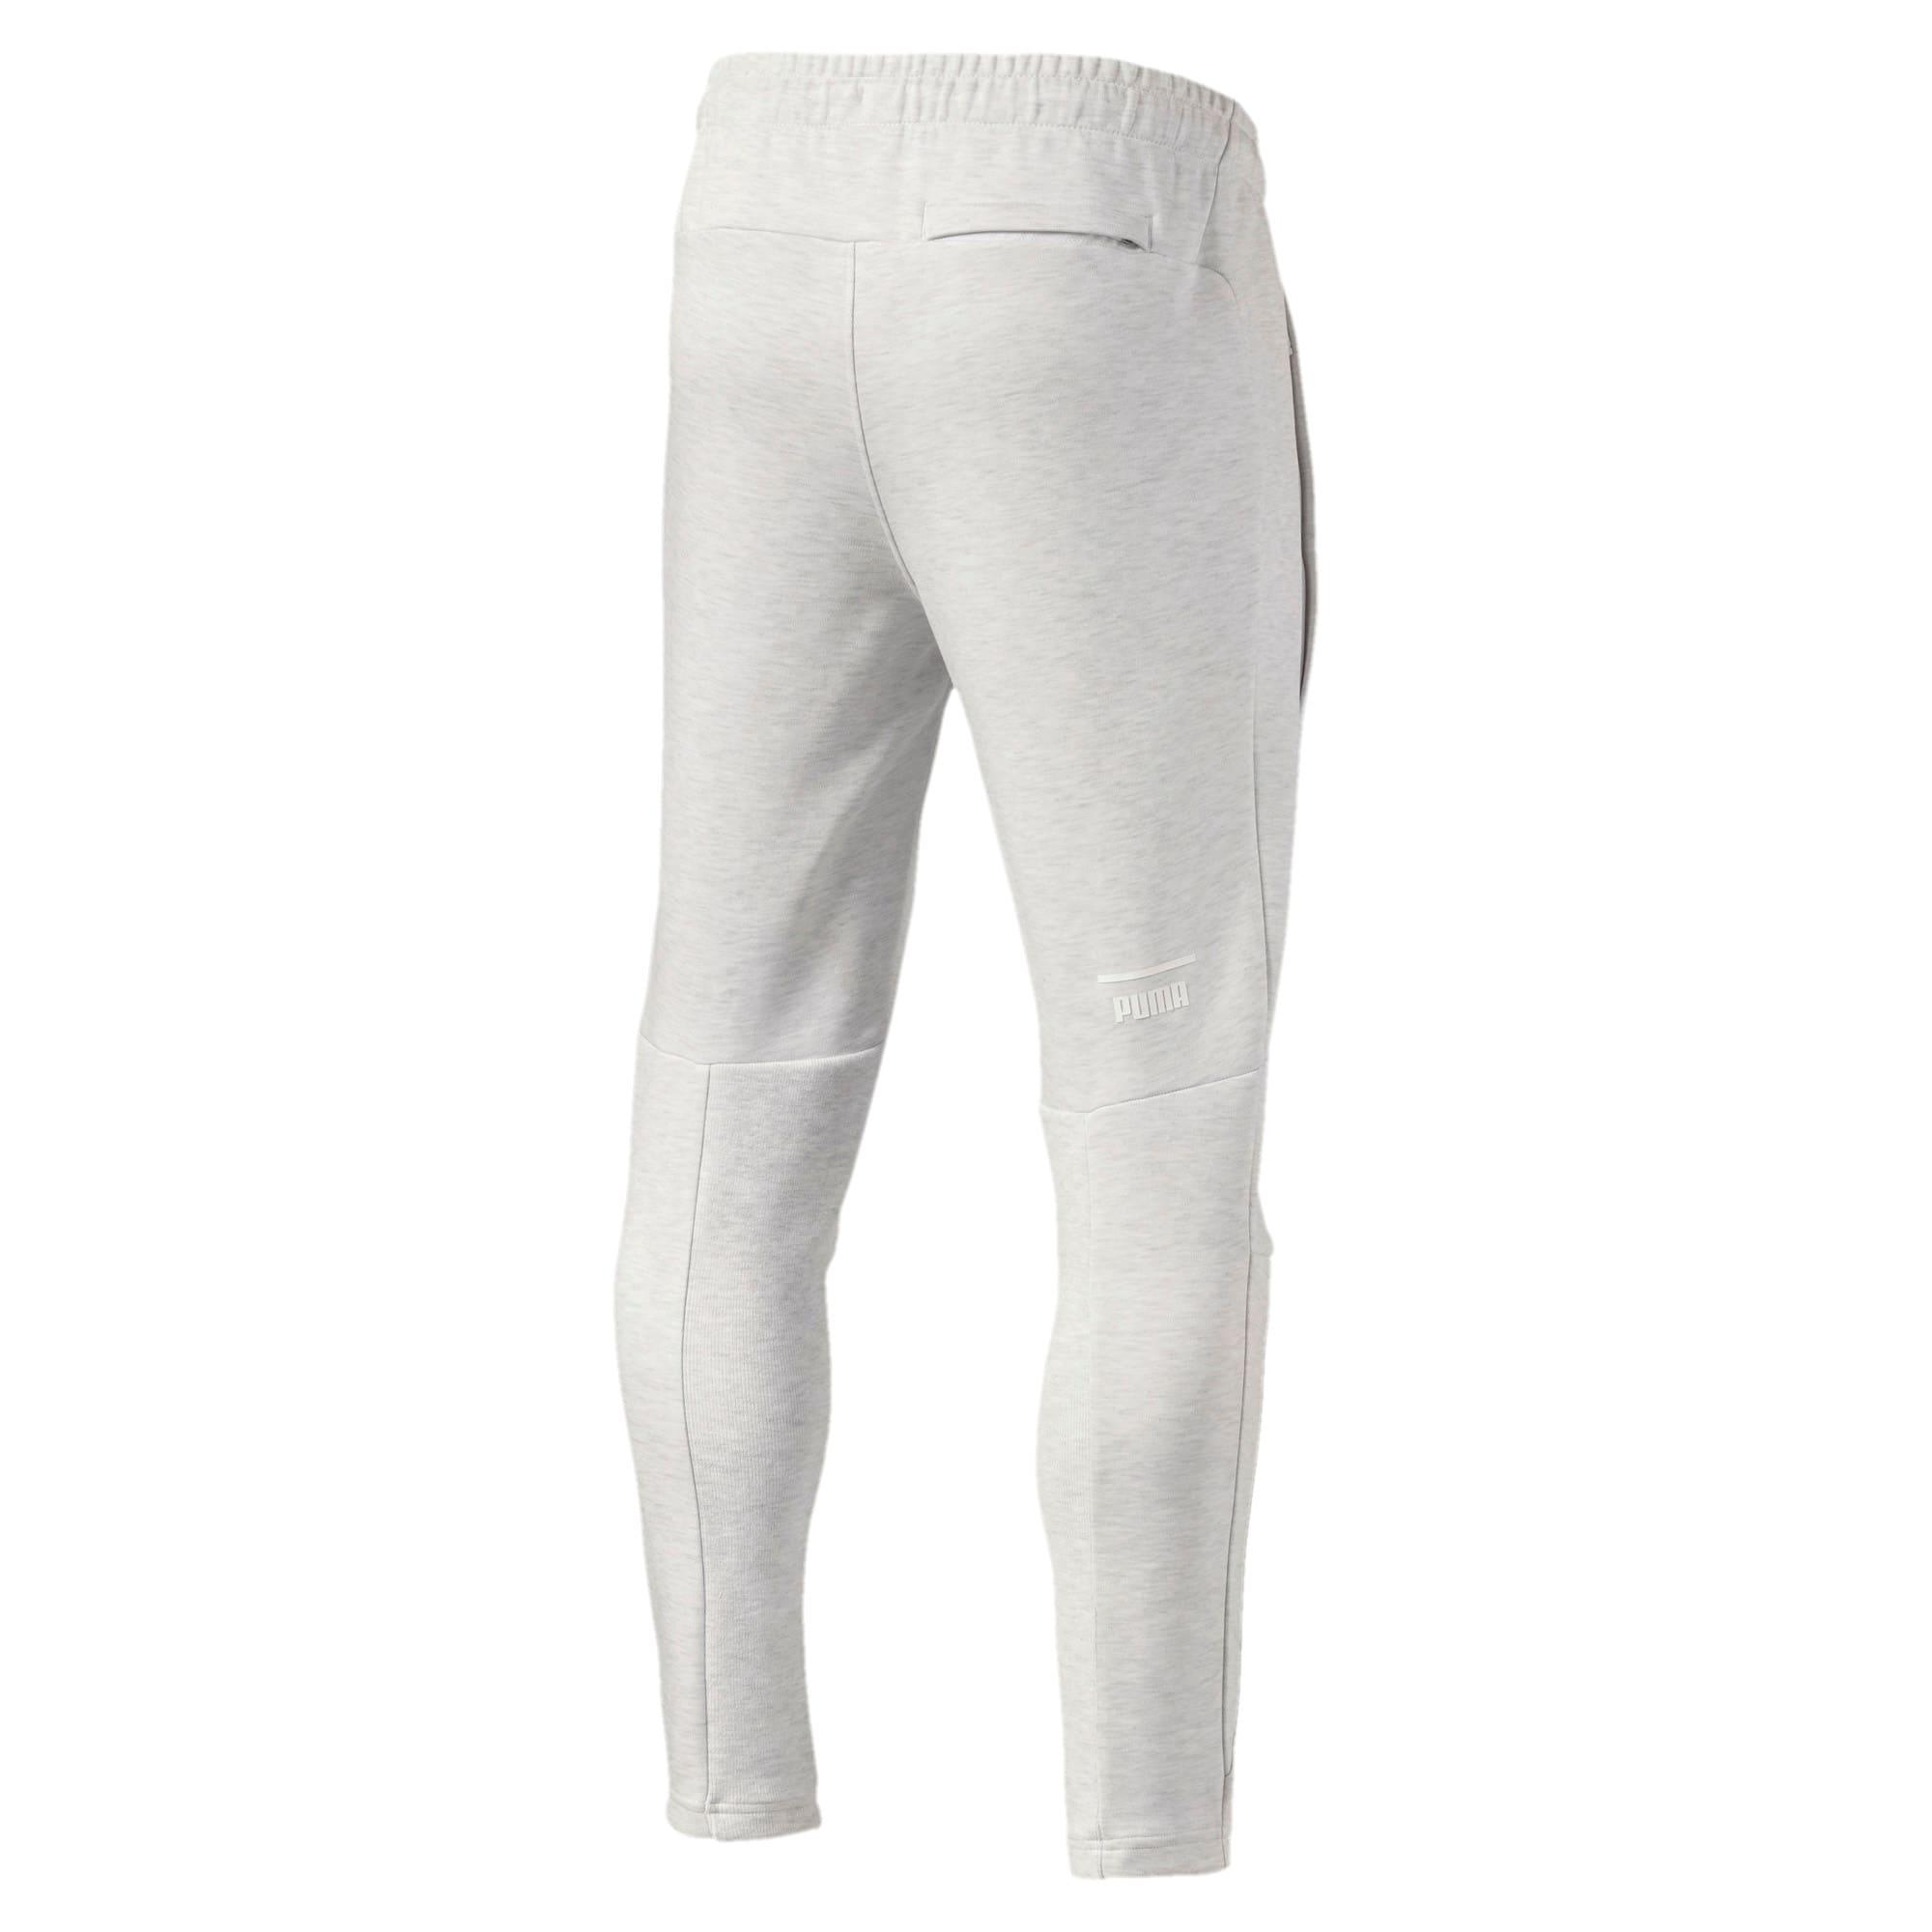 Thumbnail 2 of Pace Primary Men's Sweatpants, Puma White-Ice heather, medium-IND